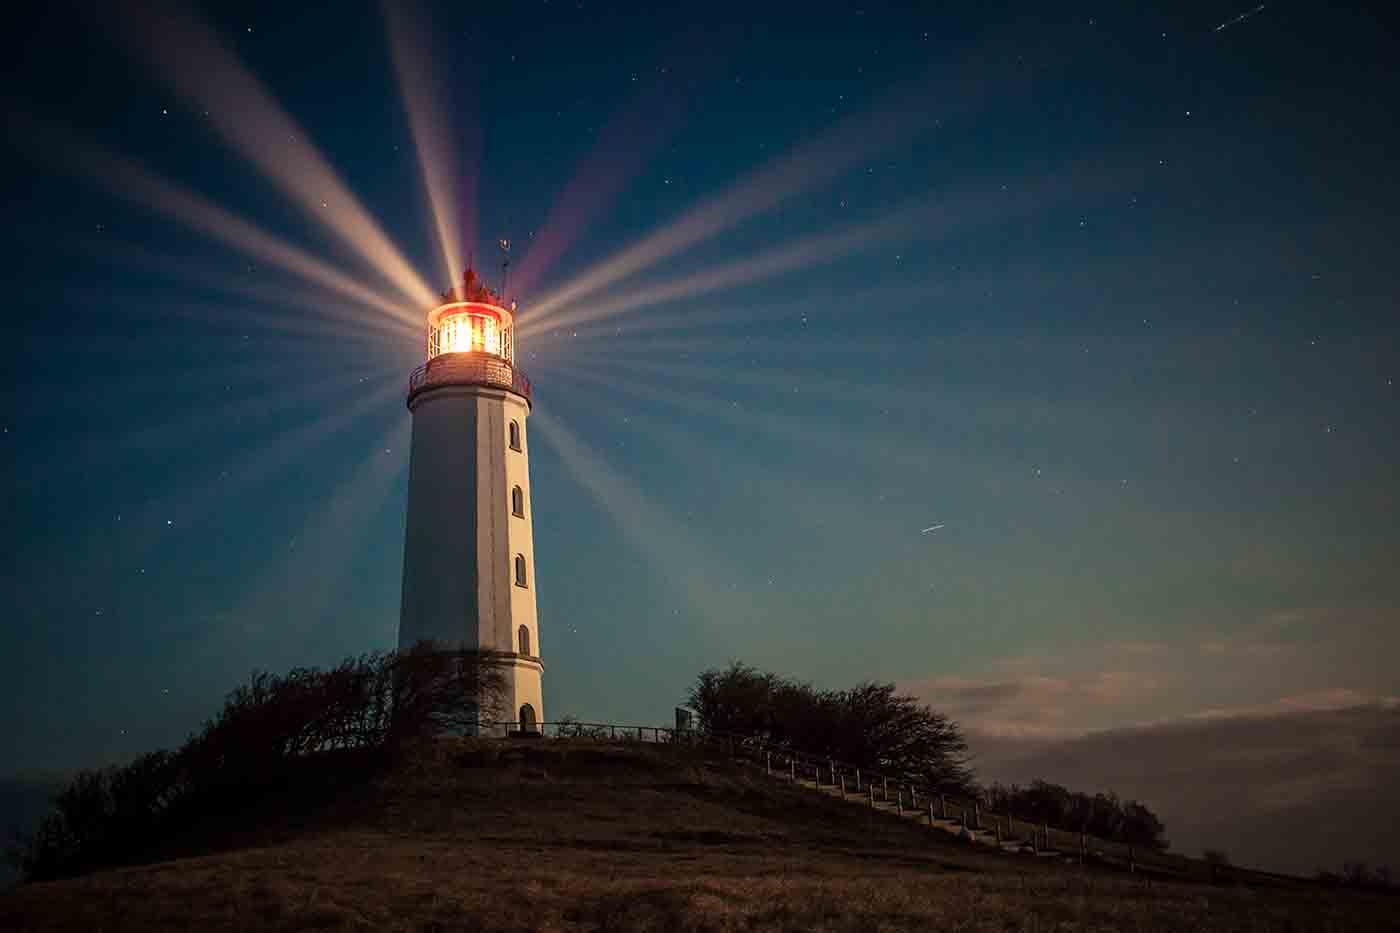 Hiddensee lighthouse shining at night on Dornbusch hill.